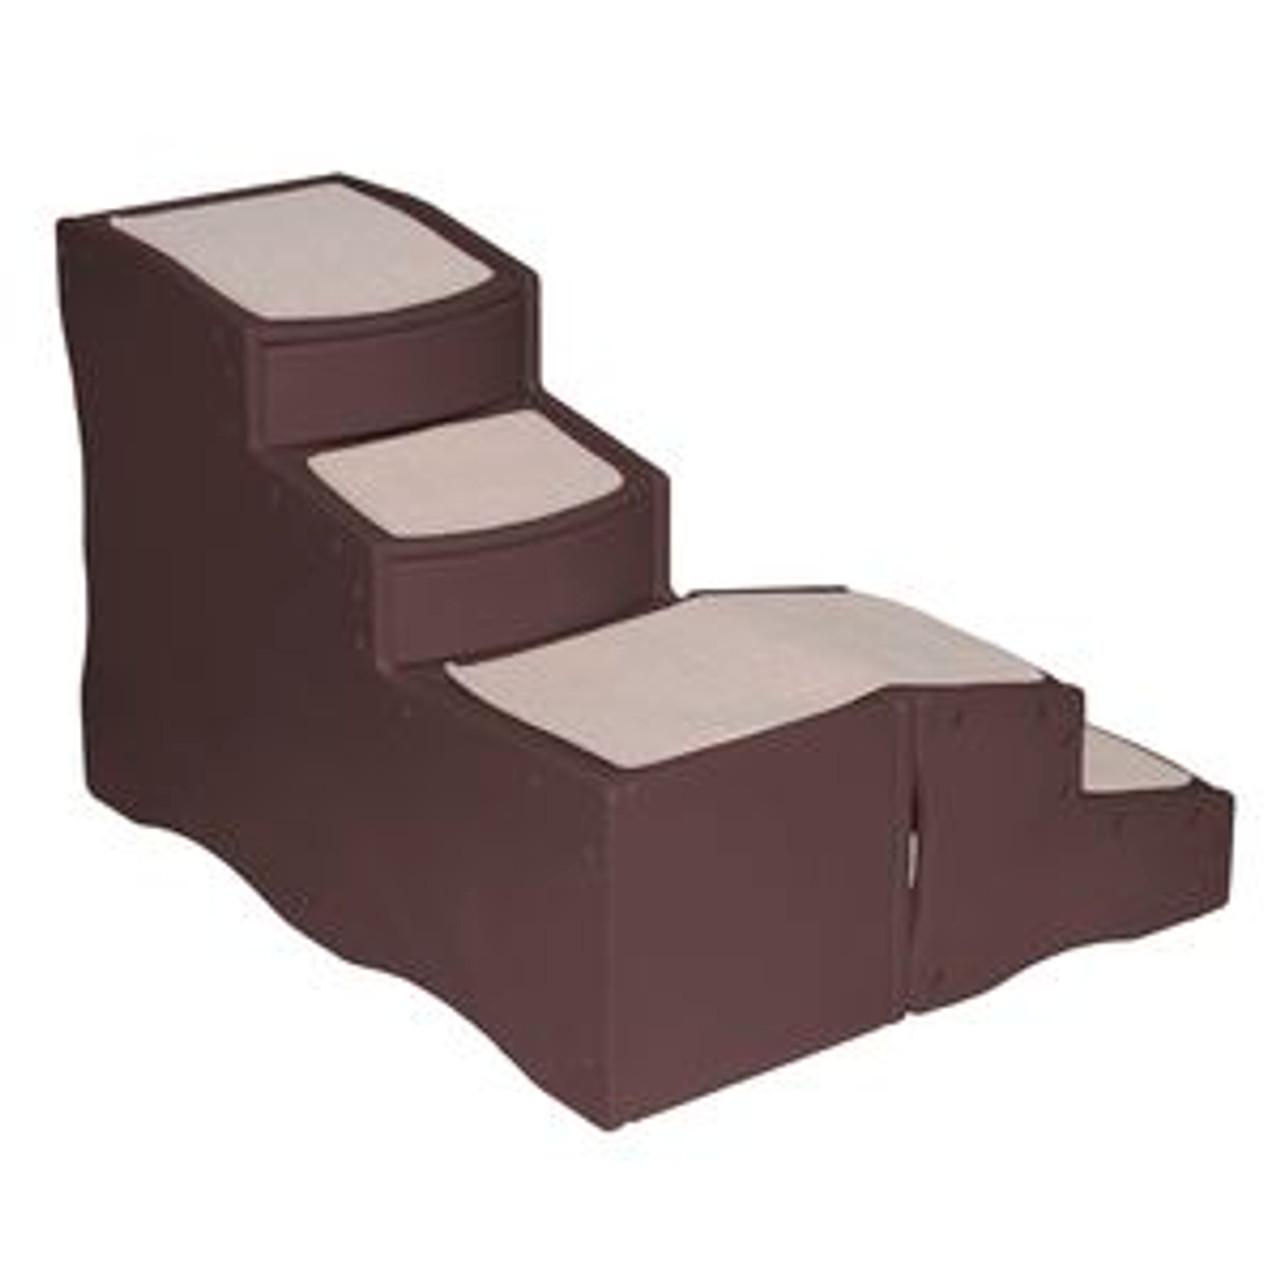 Eazy Step Bed Stair